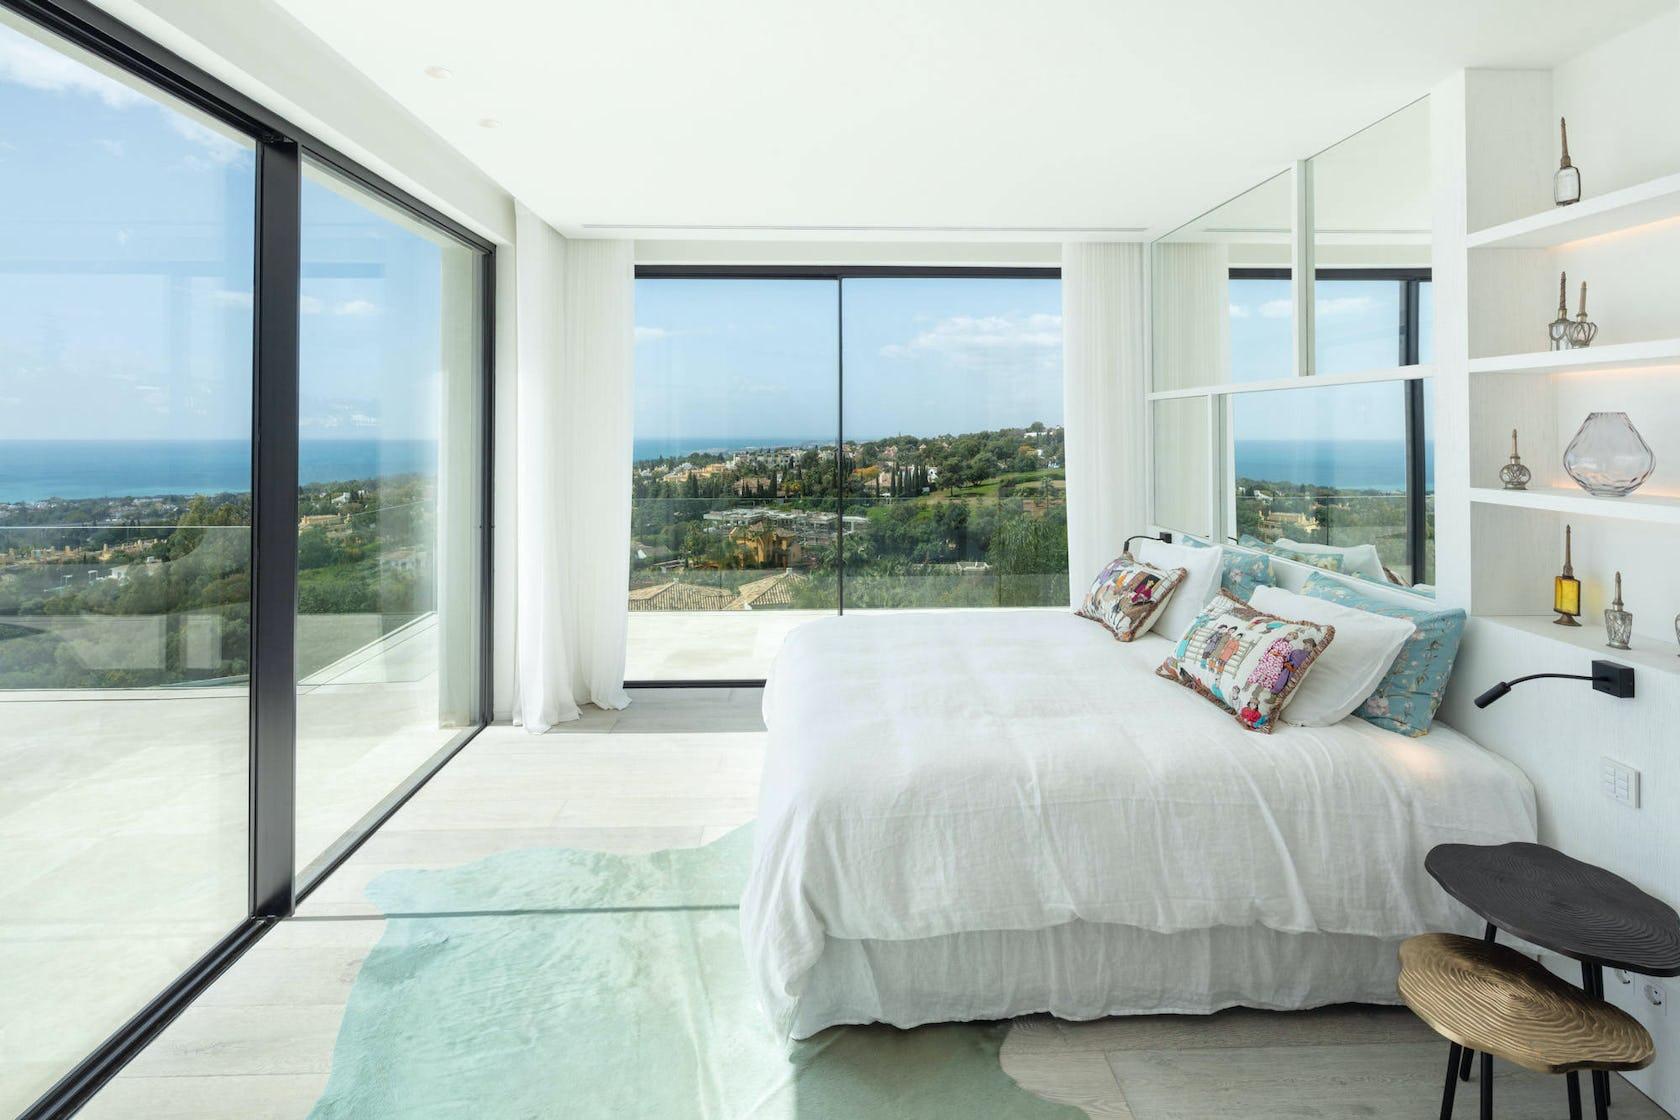 home decor bedroom indoors room furniture bed housing building